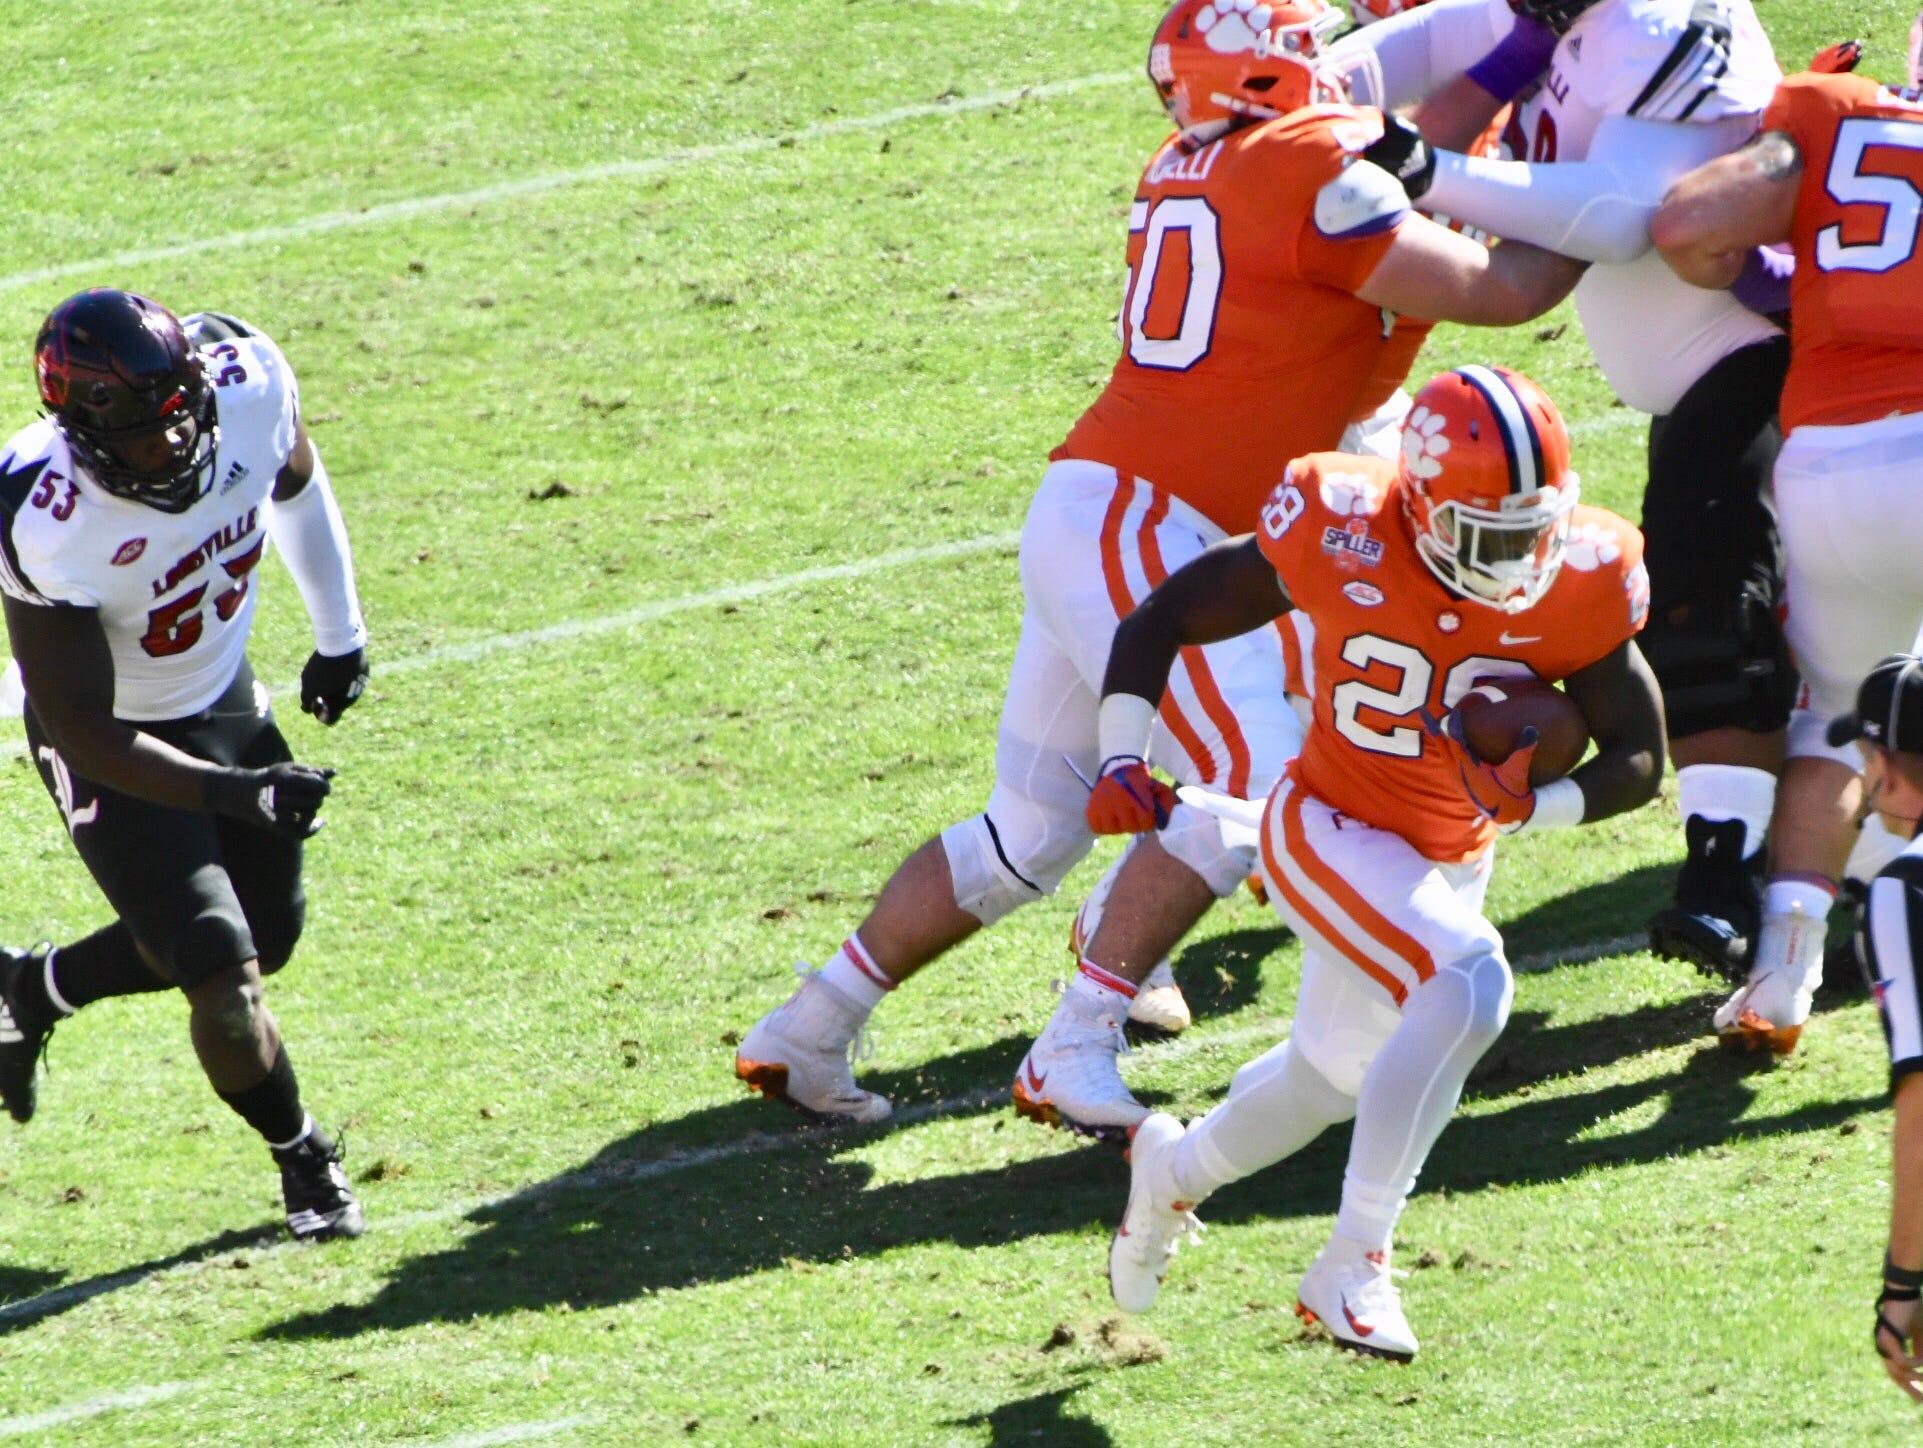 Clemson's Tevin Feaster breaks through for a 70-yard touchdown against Louisville.